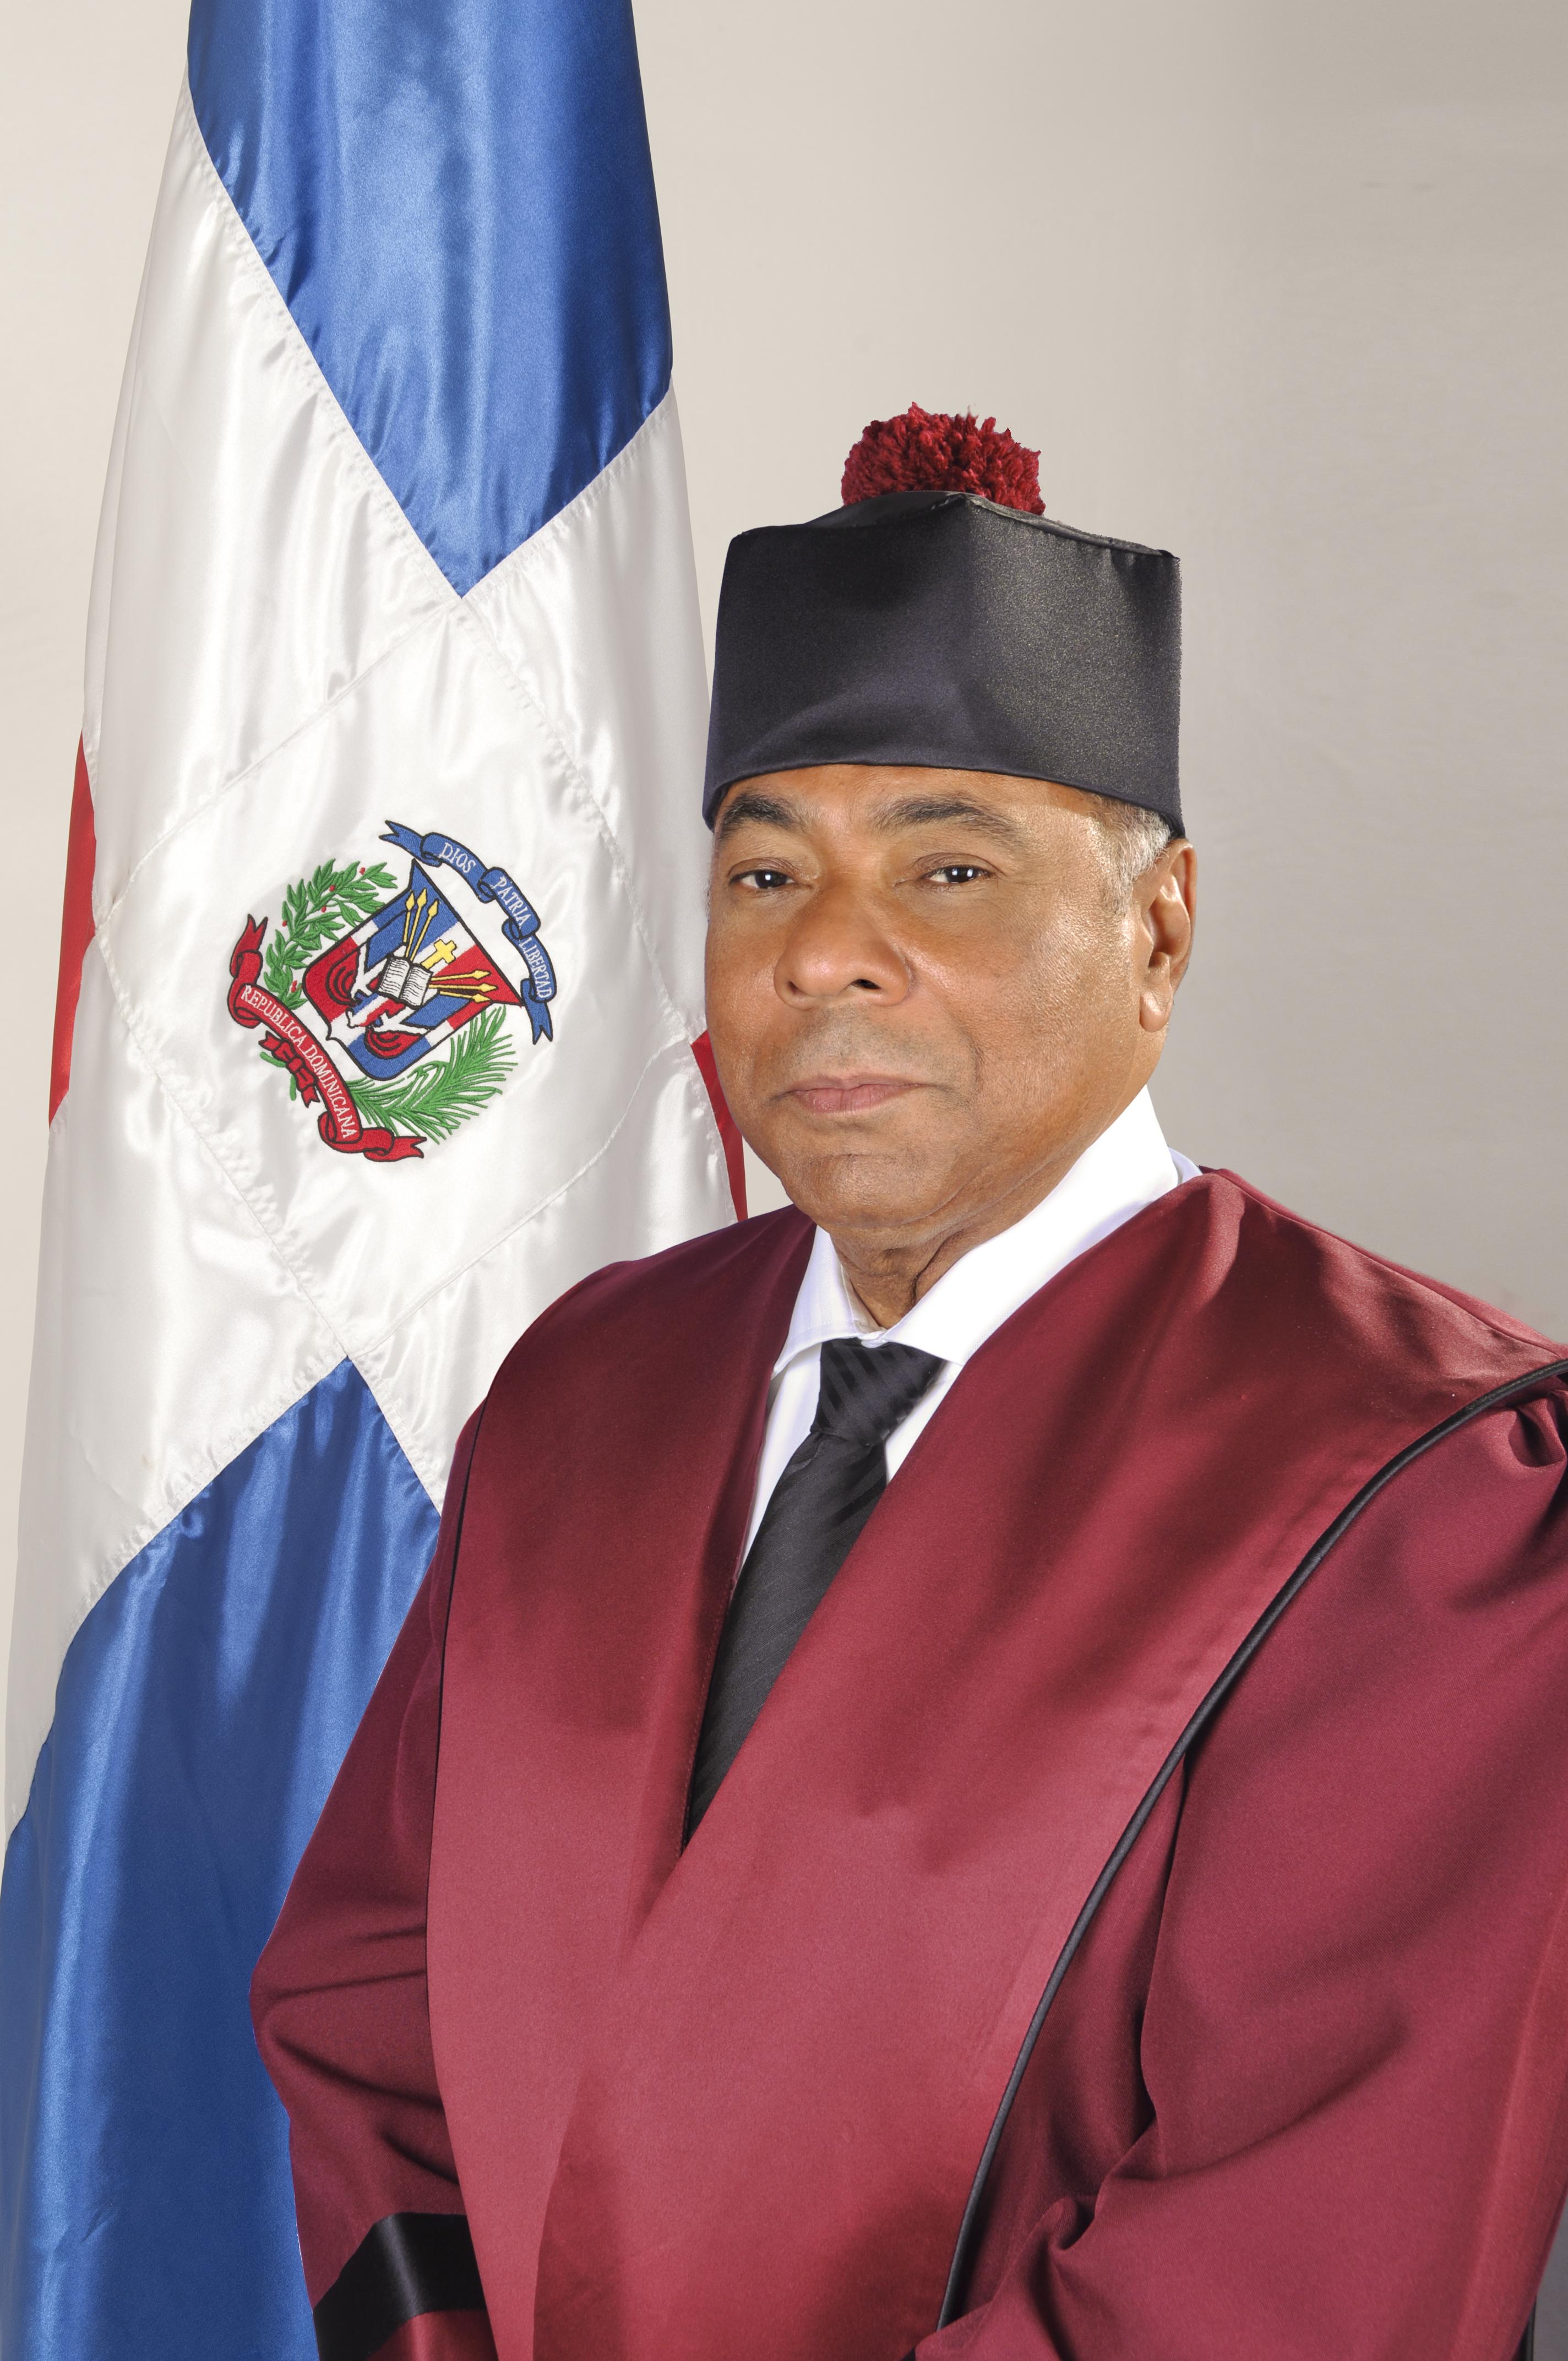 Presidente TC participará en congreso mundial de justicia constitucional